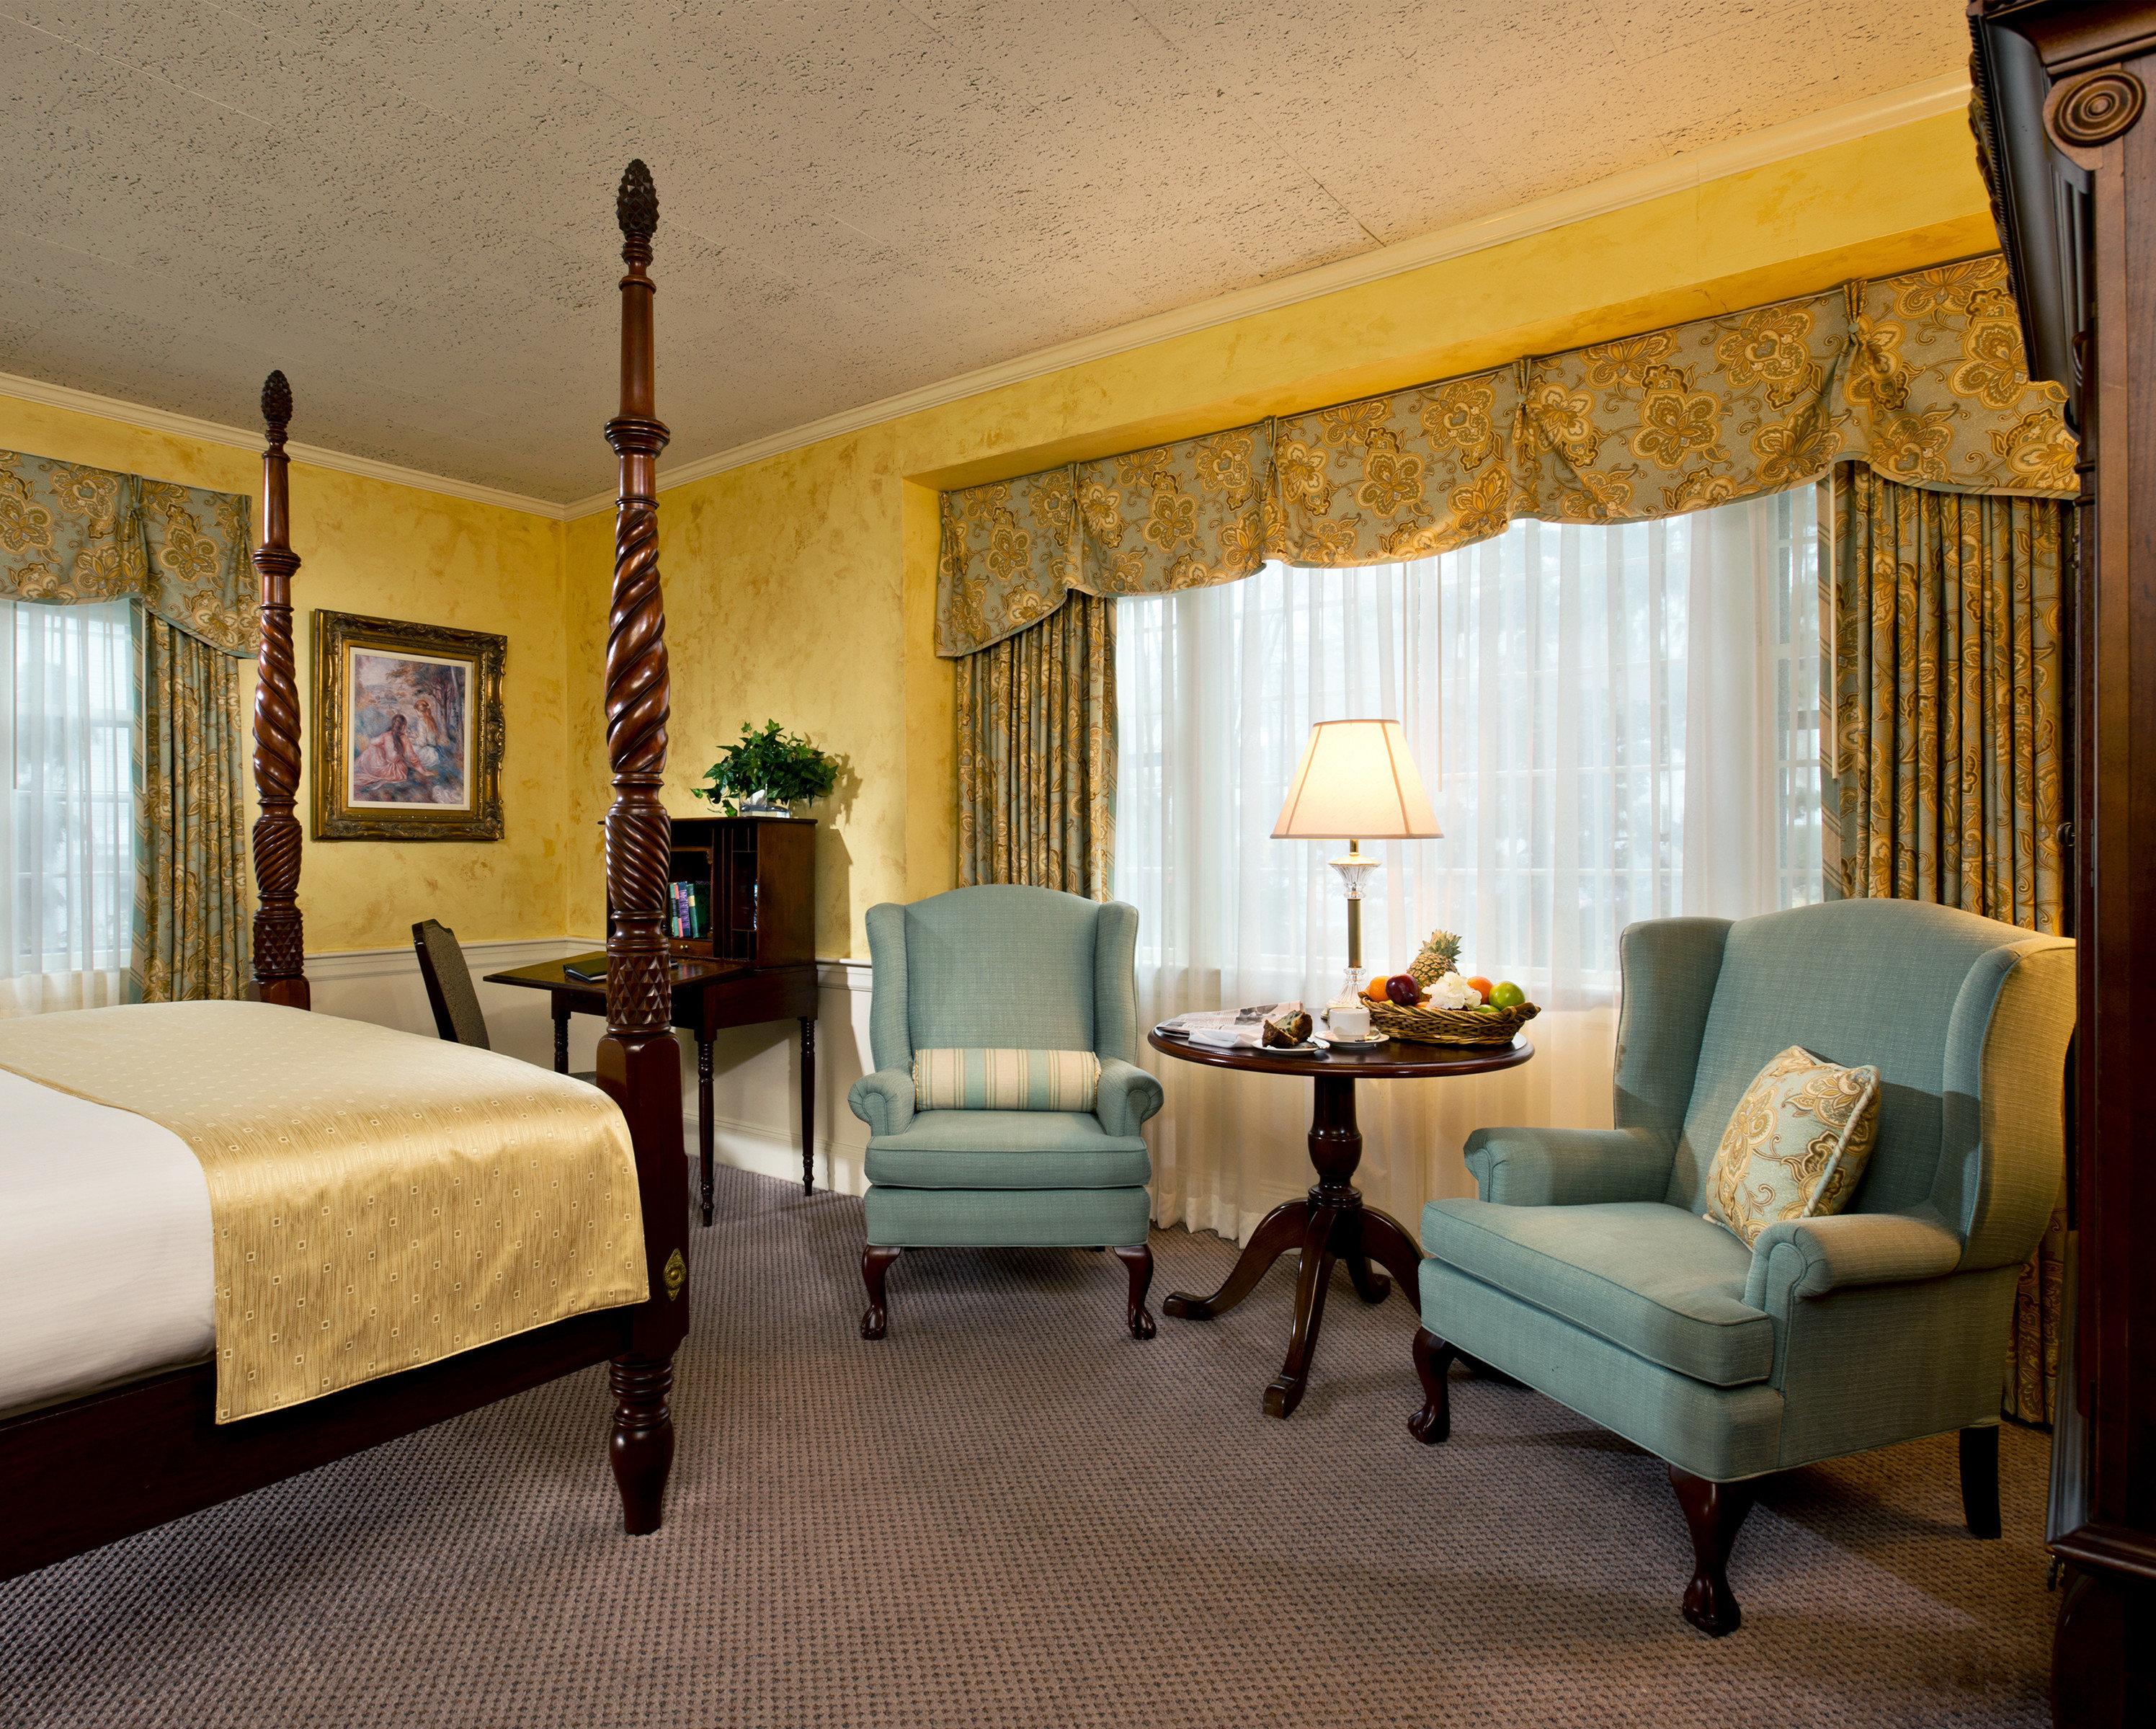 Bedroom Classic Inn Romantic Spa Waterfront property living room Suite home hardwood cottage Villa farmhouse